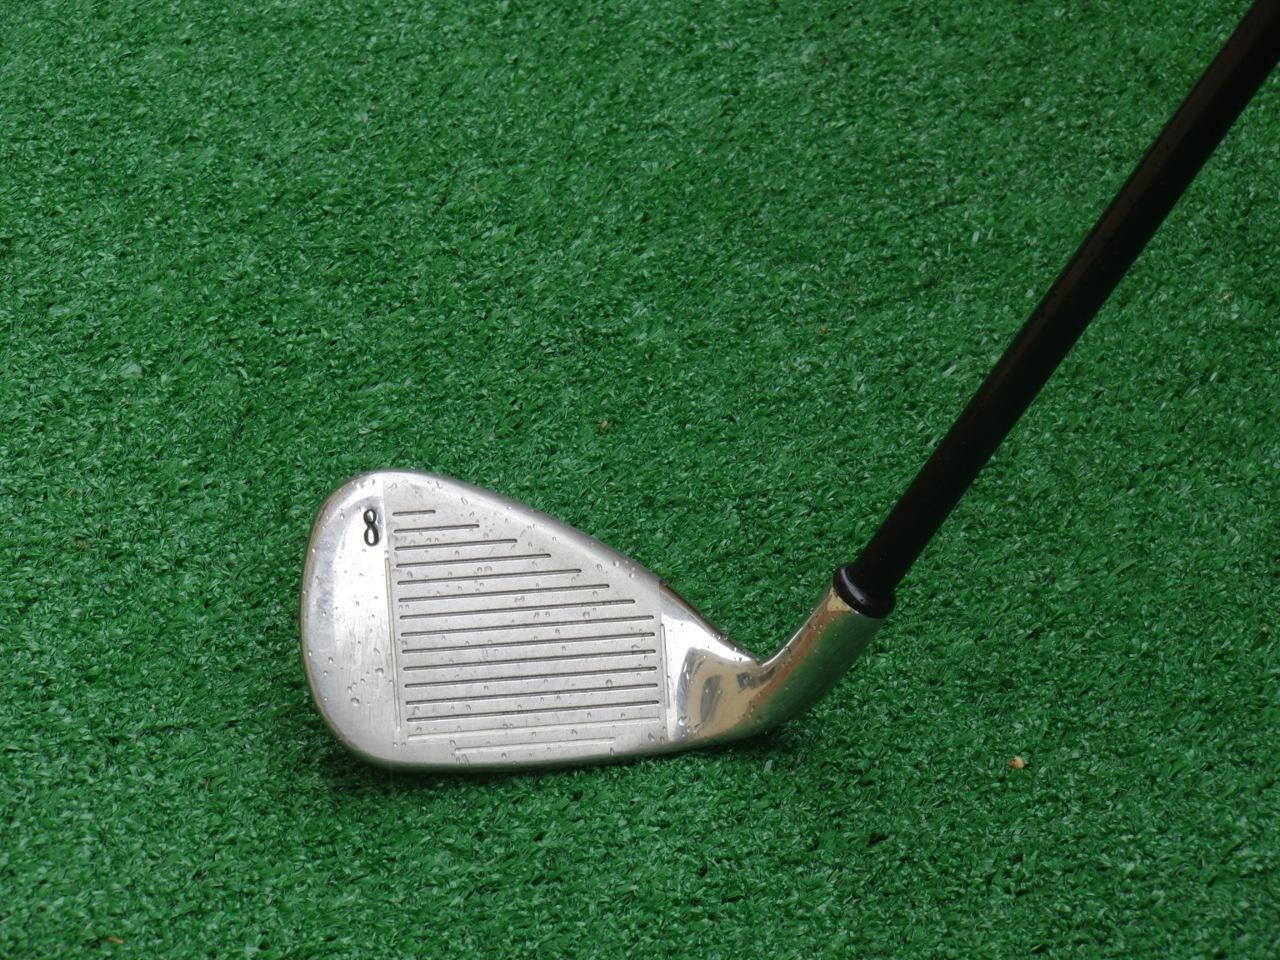 Description Golf club  Callawax X-20 8 iron - III jpgGolf Club Iron